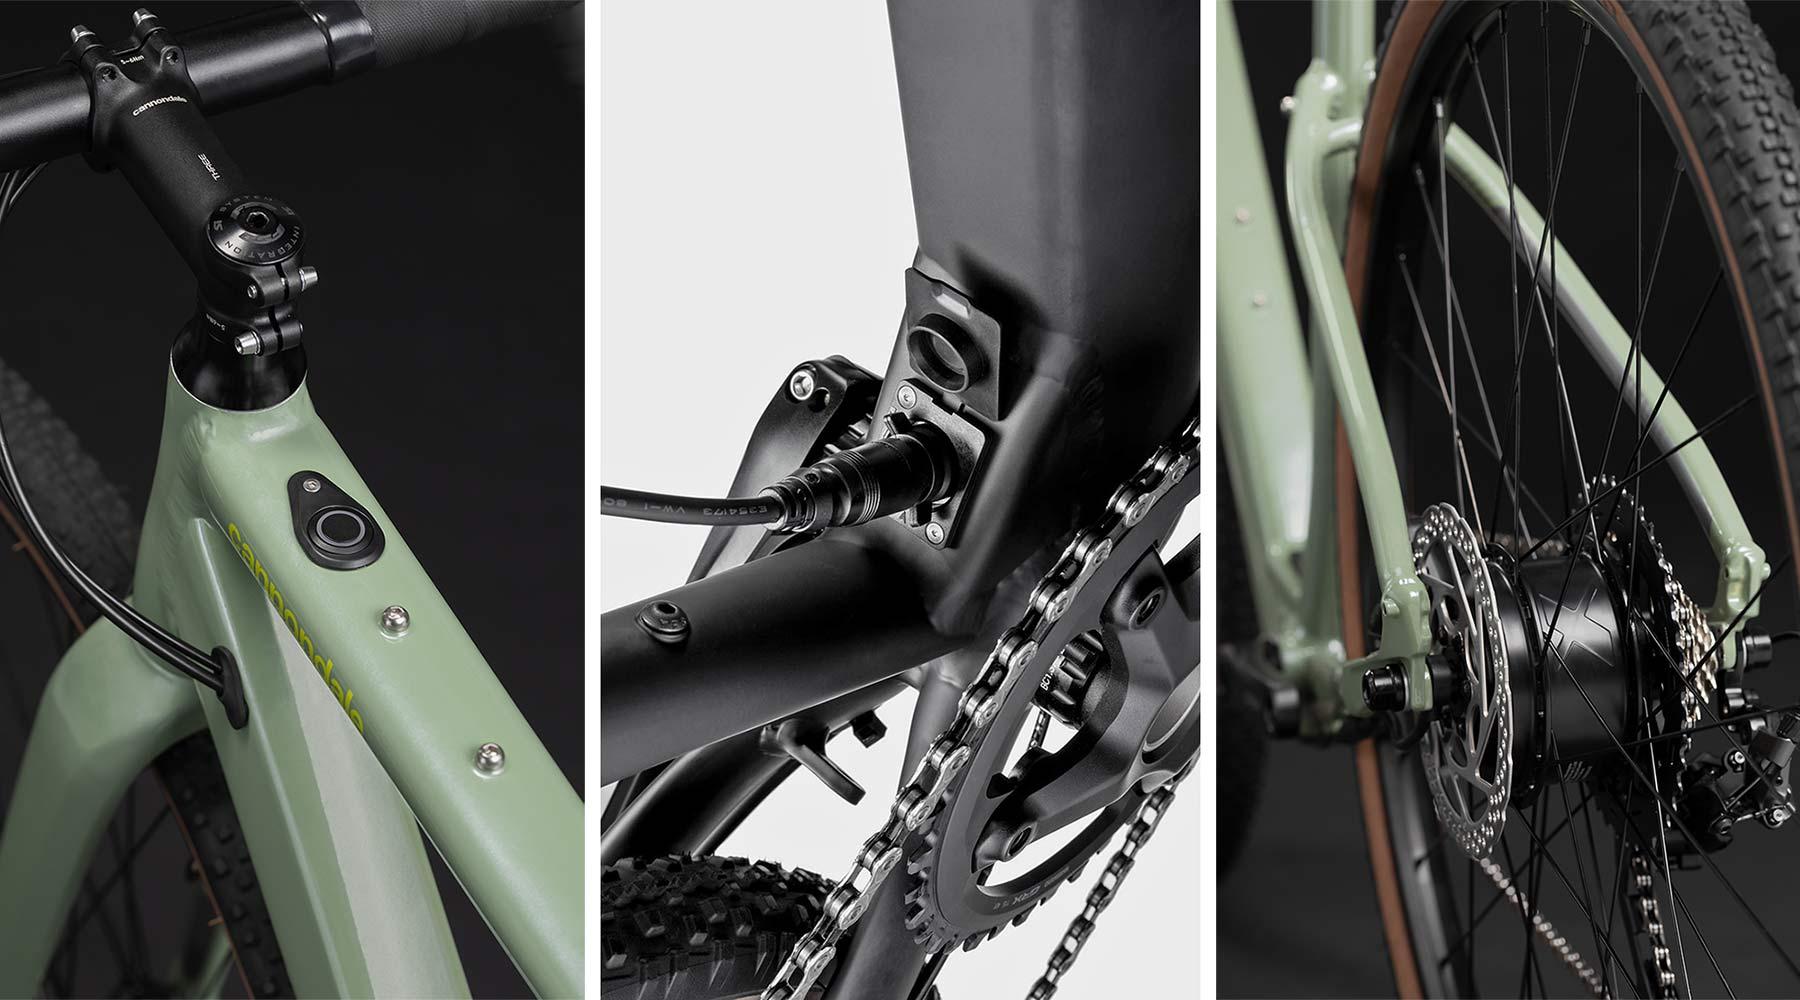 Cannondale Topstone Neo SL lightweight affordable alloy gravel e-bike,Mahle ebikemotion X35+ details